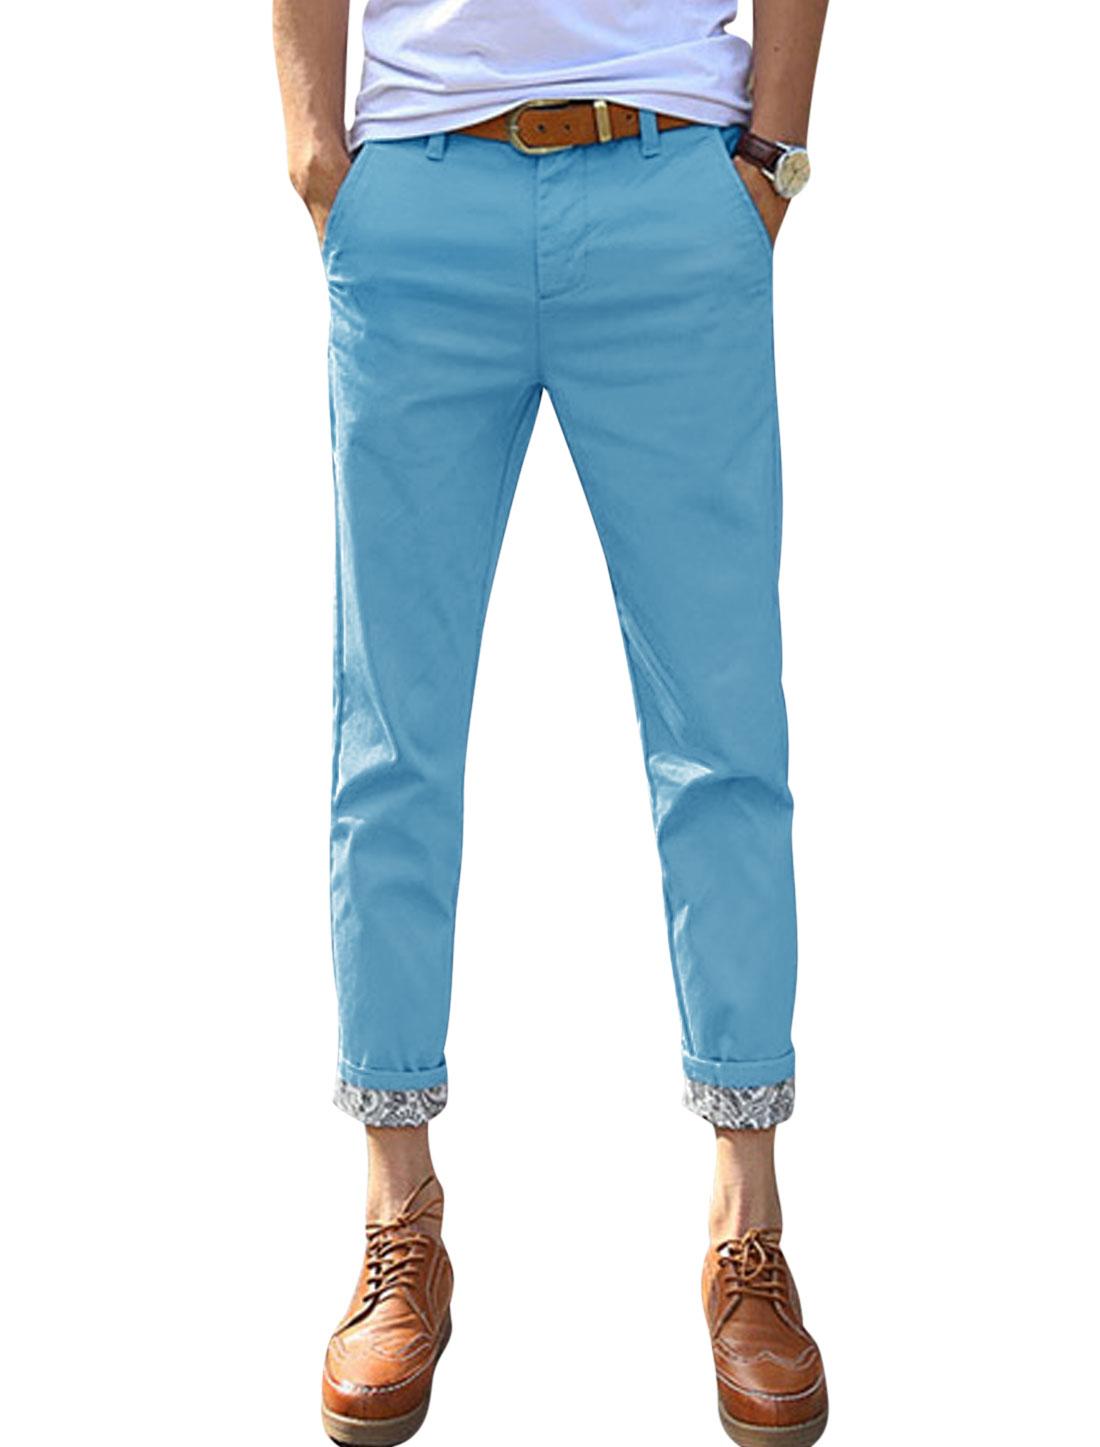 Men Jacquard Design Detail Belt Loop Slim Fit Casual Cropped Pants Light Blue W32